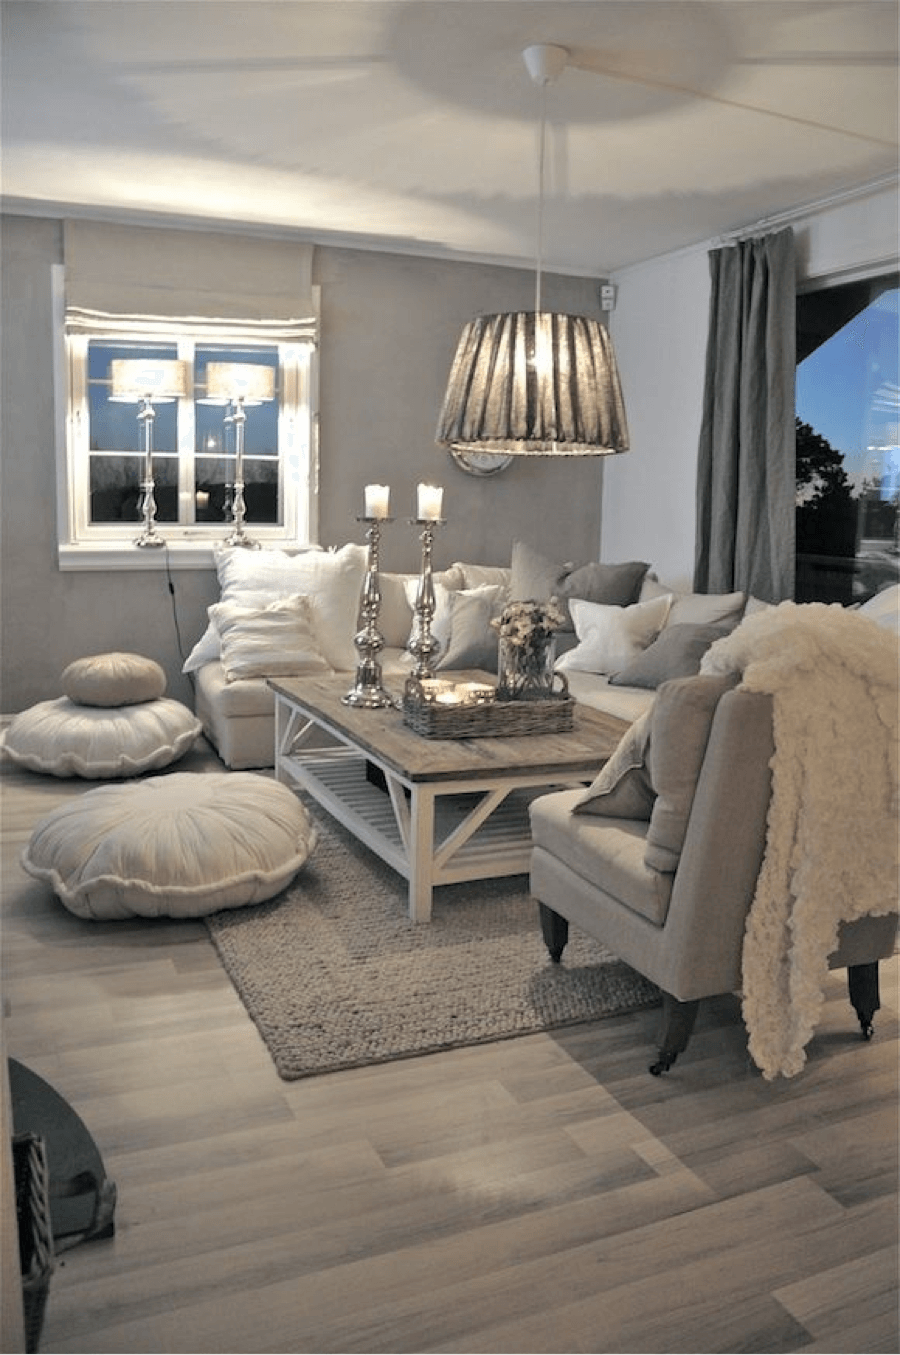 Rustic Chic Living Rooms Ideas - Fluffy Soft Glow Driftwood - Cabritonyc.com